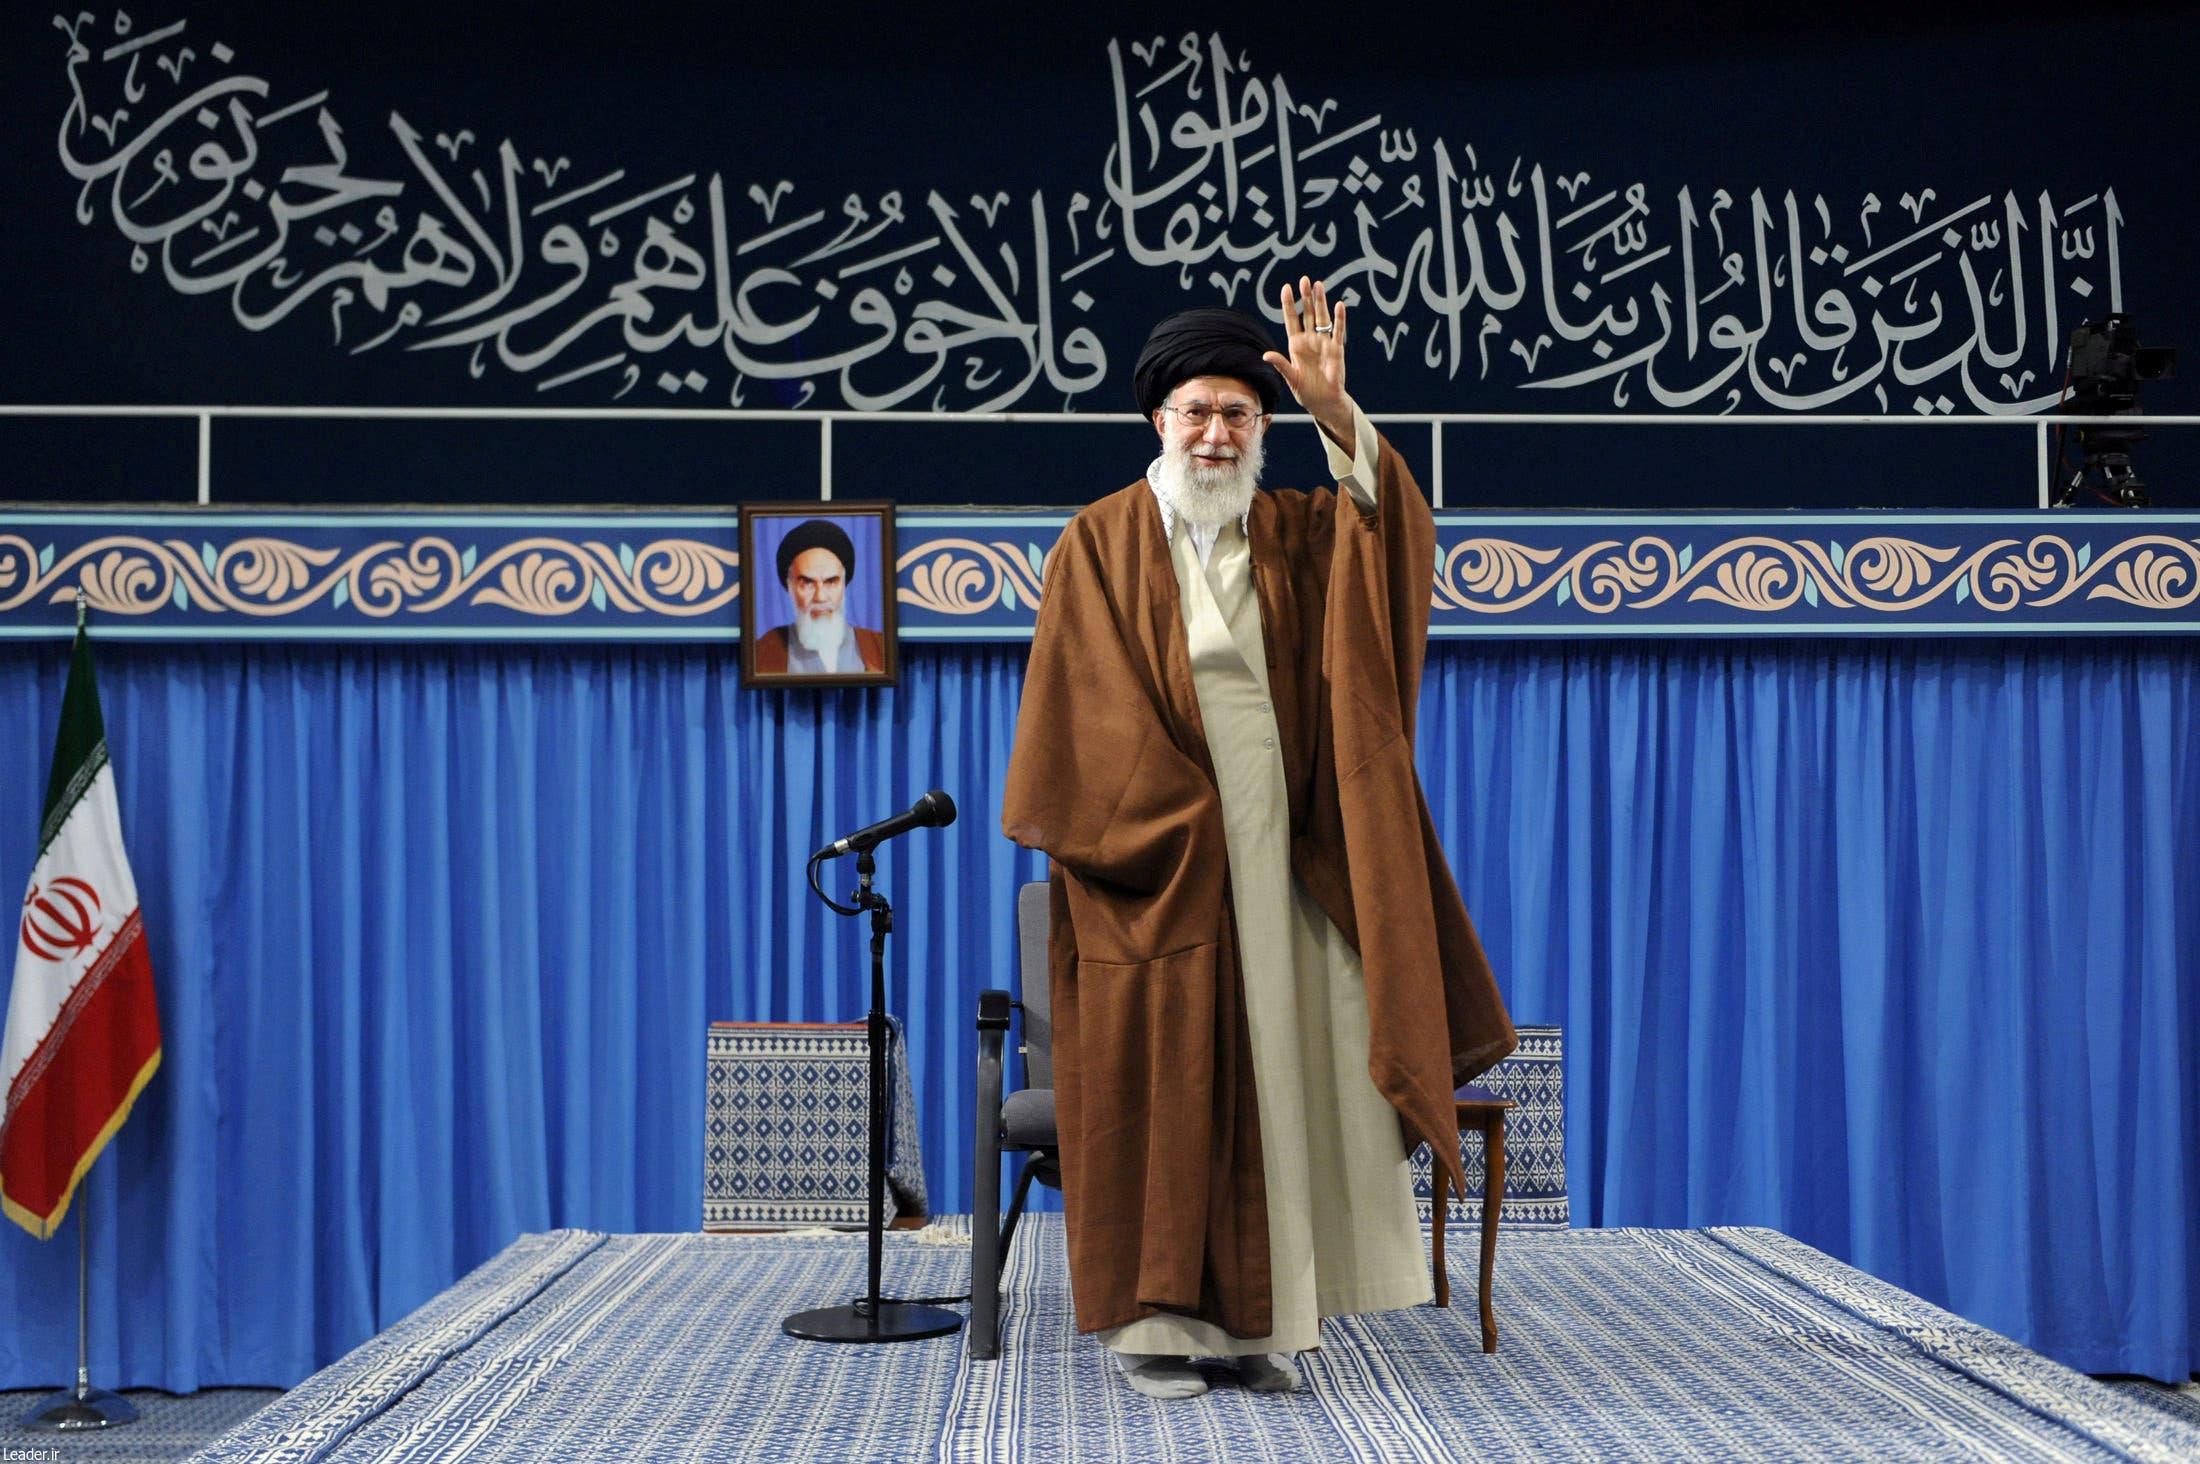 Ayatollah Ali Khamenei arrives to deliver a speech in Tehran on November 2, 2017. (Reuters)